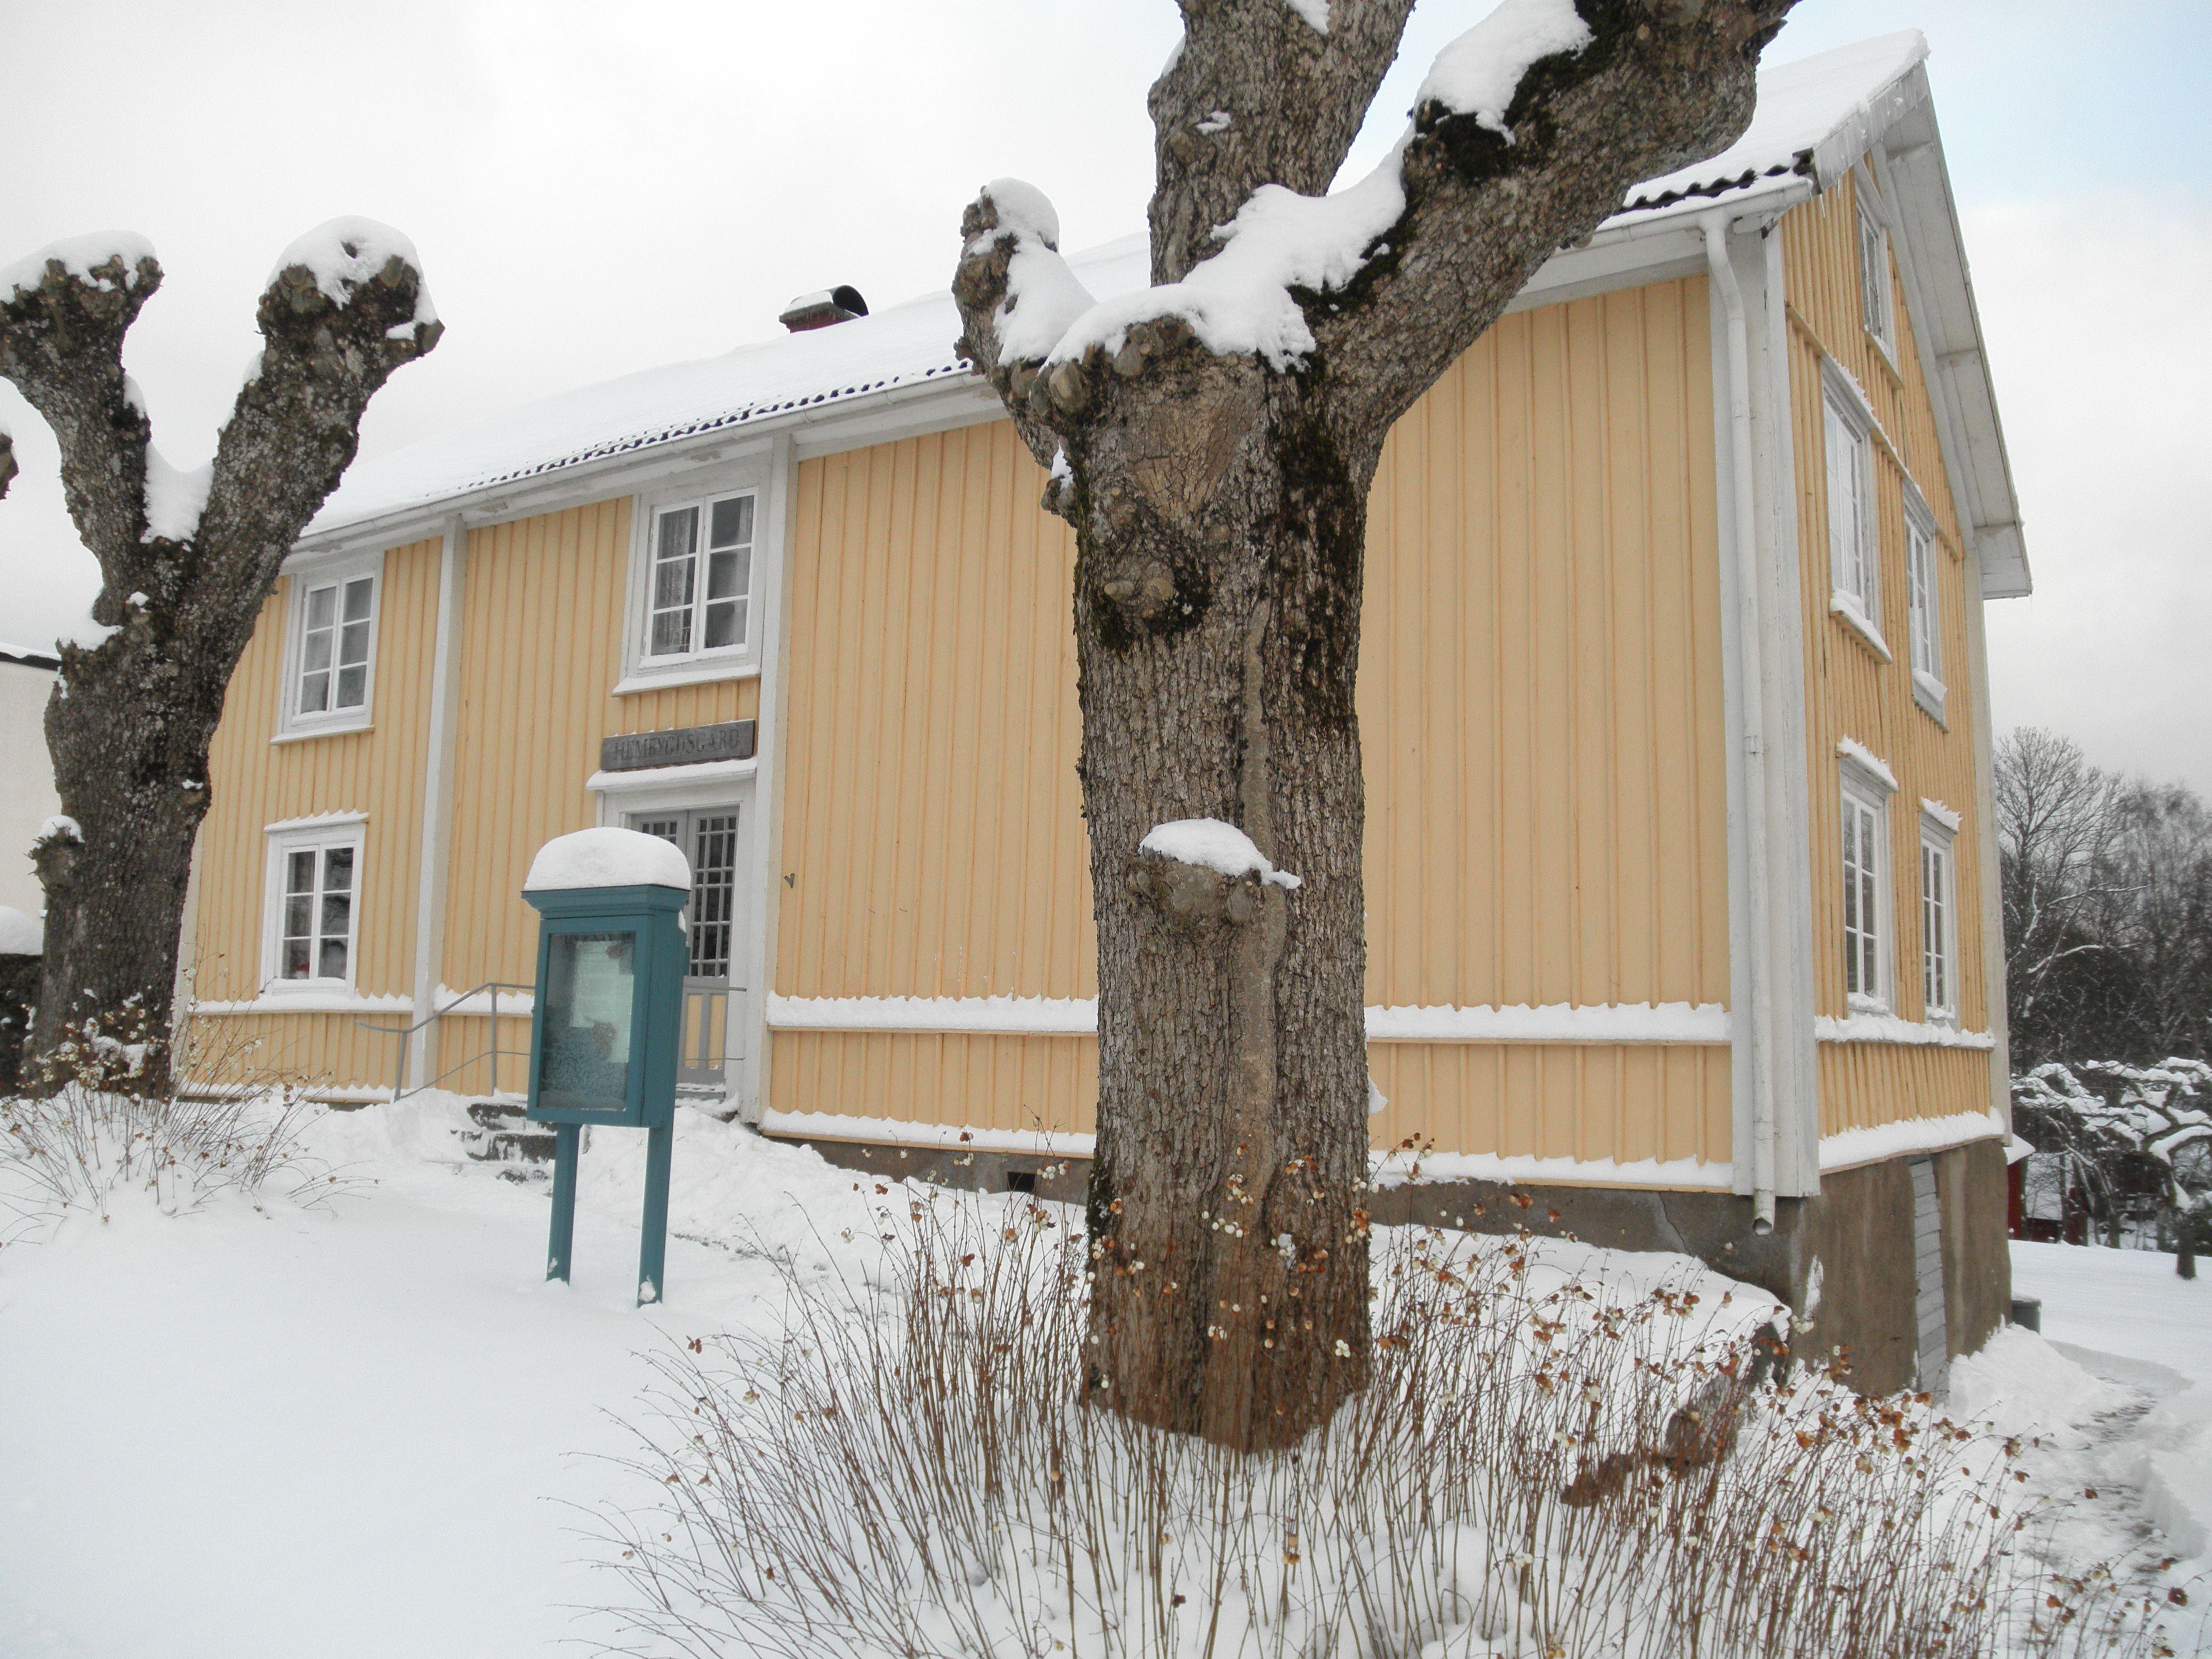 Simon Stamming,  © Tingsryds Kommun, Hembygdsgården i Tingsryd